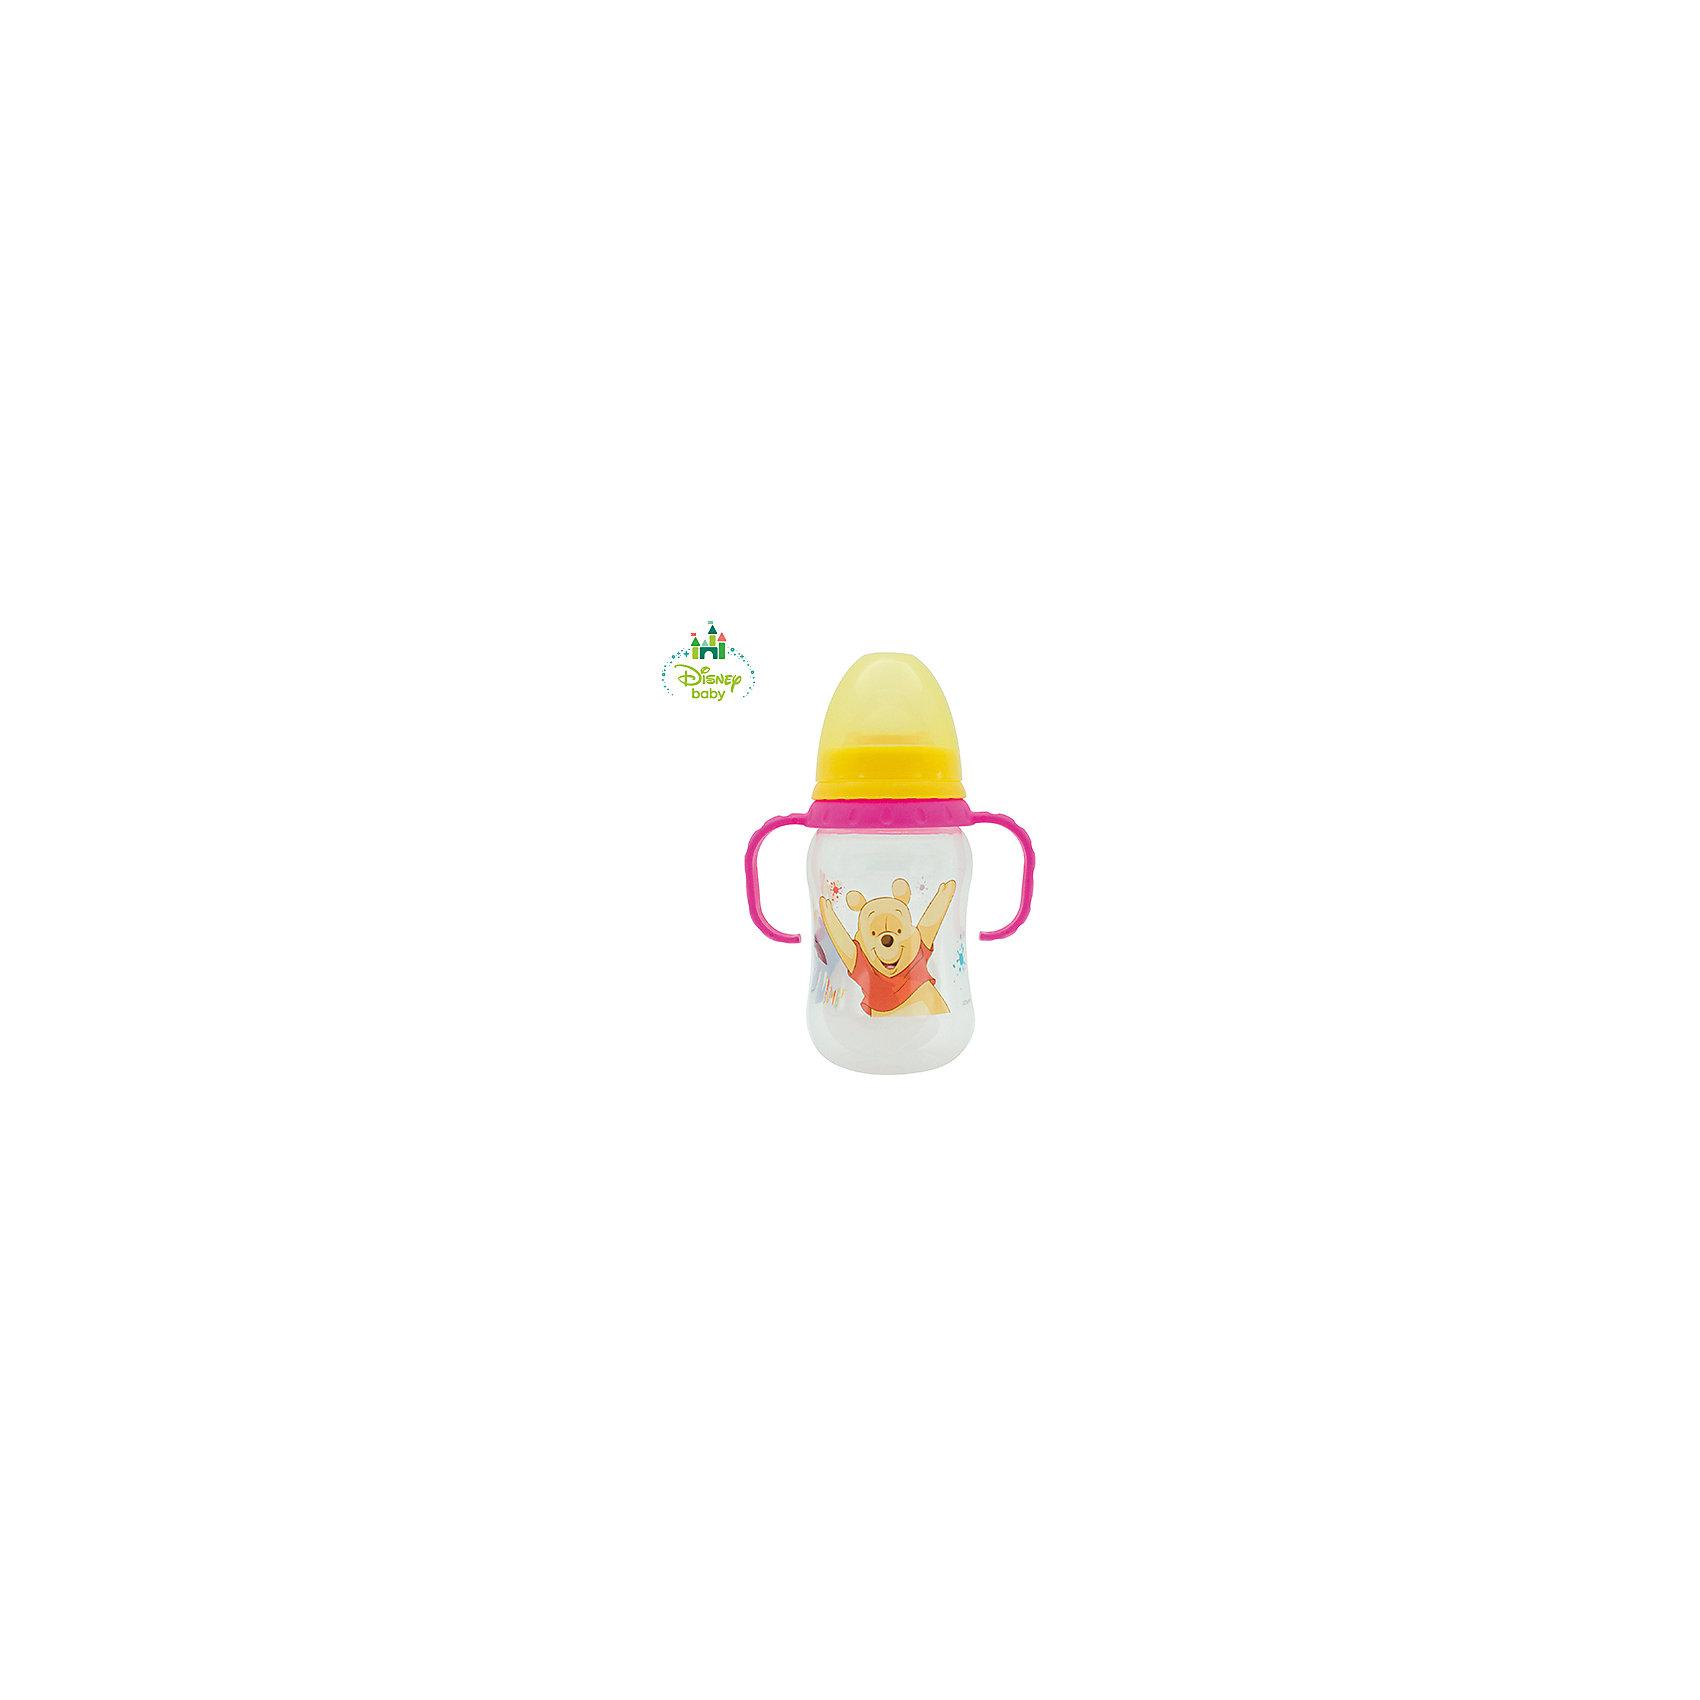 LUBBY Бутылочка Медвежонок Винни DISNEY от 6 мес., 250 мл., LUBBY, розовый/желтый тефаль бутылочка tefal disney стекло 110 мл 1 шт td6000k0